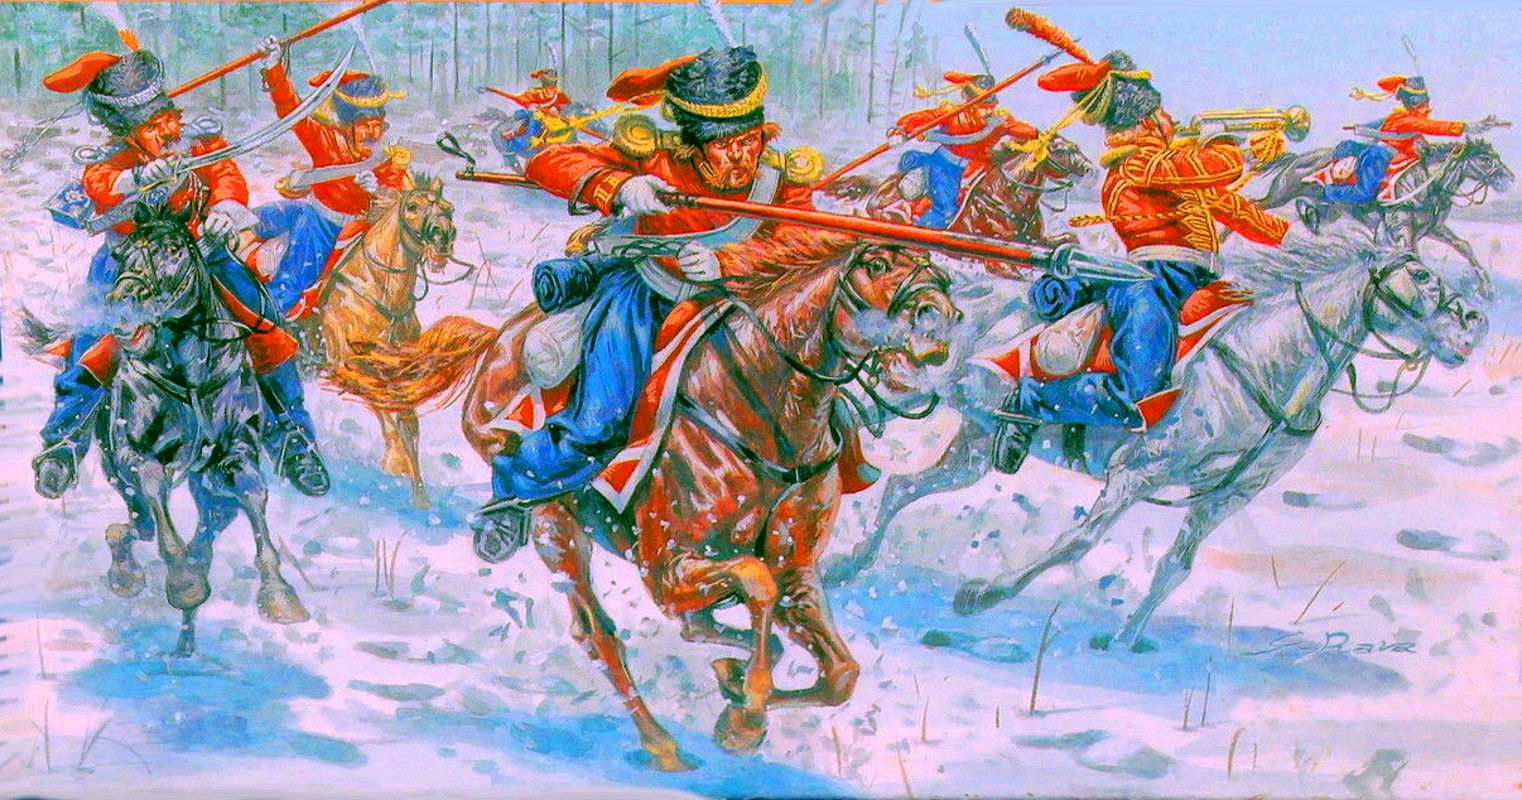 Russian Guard Cossacks charging by Giuseppe Rava